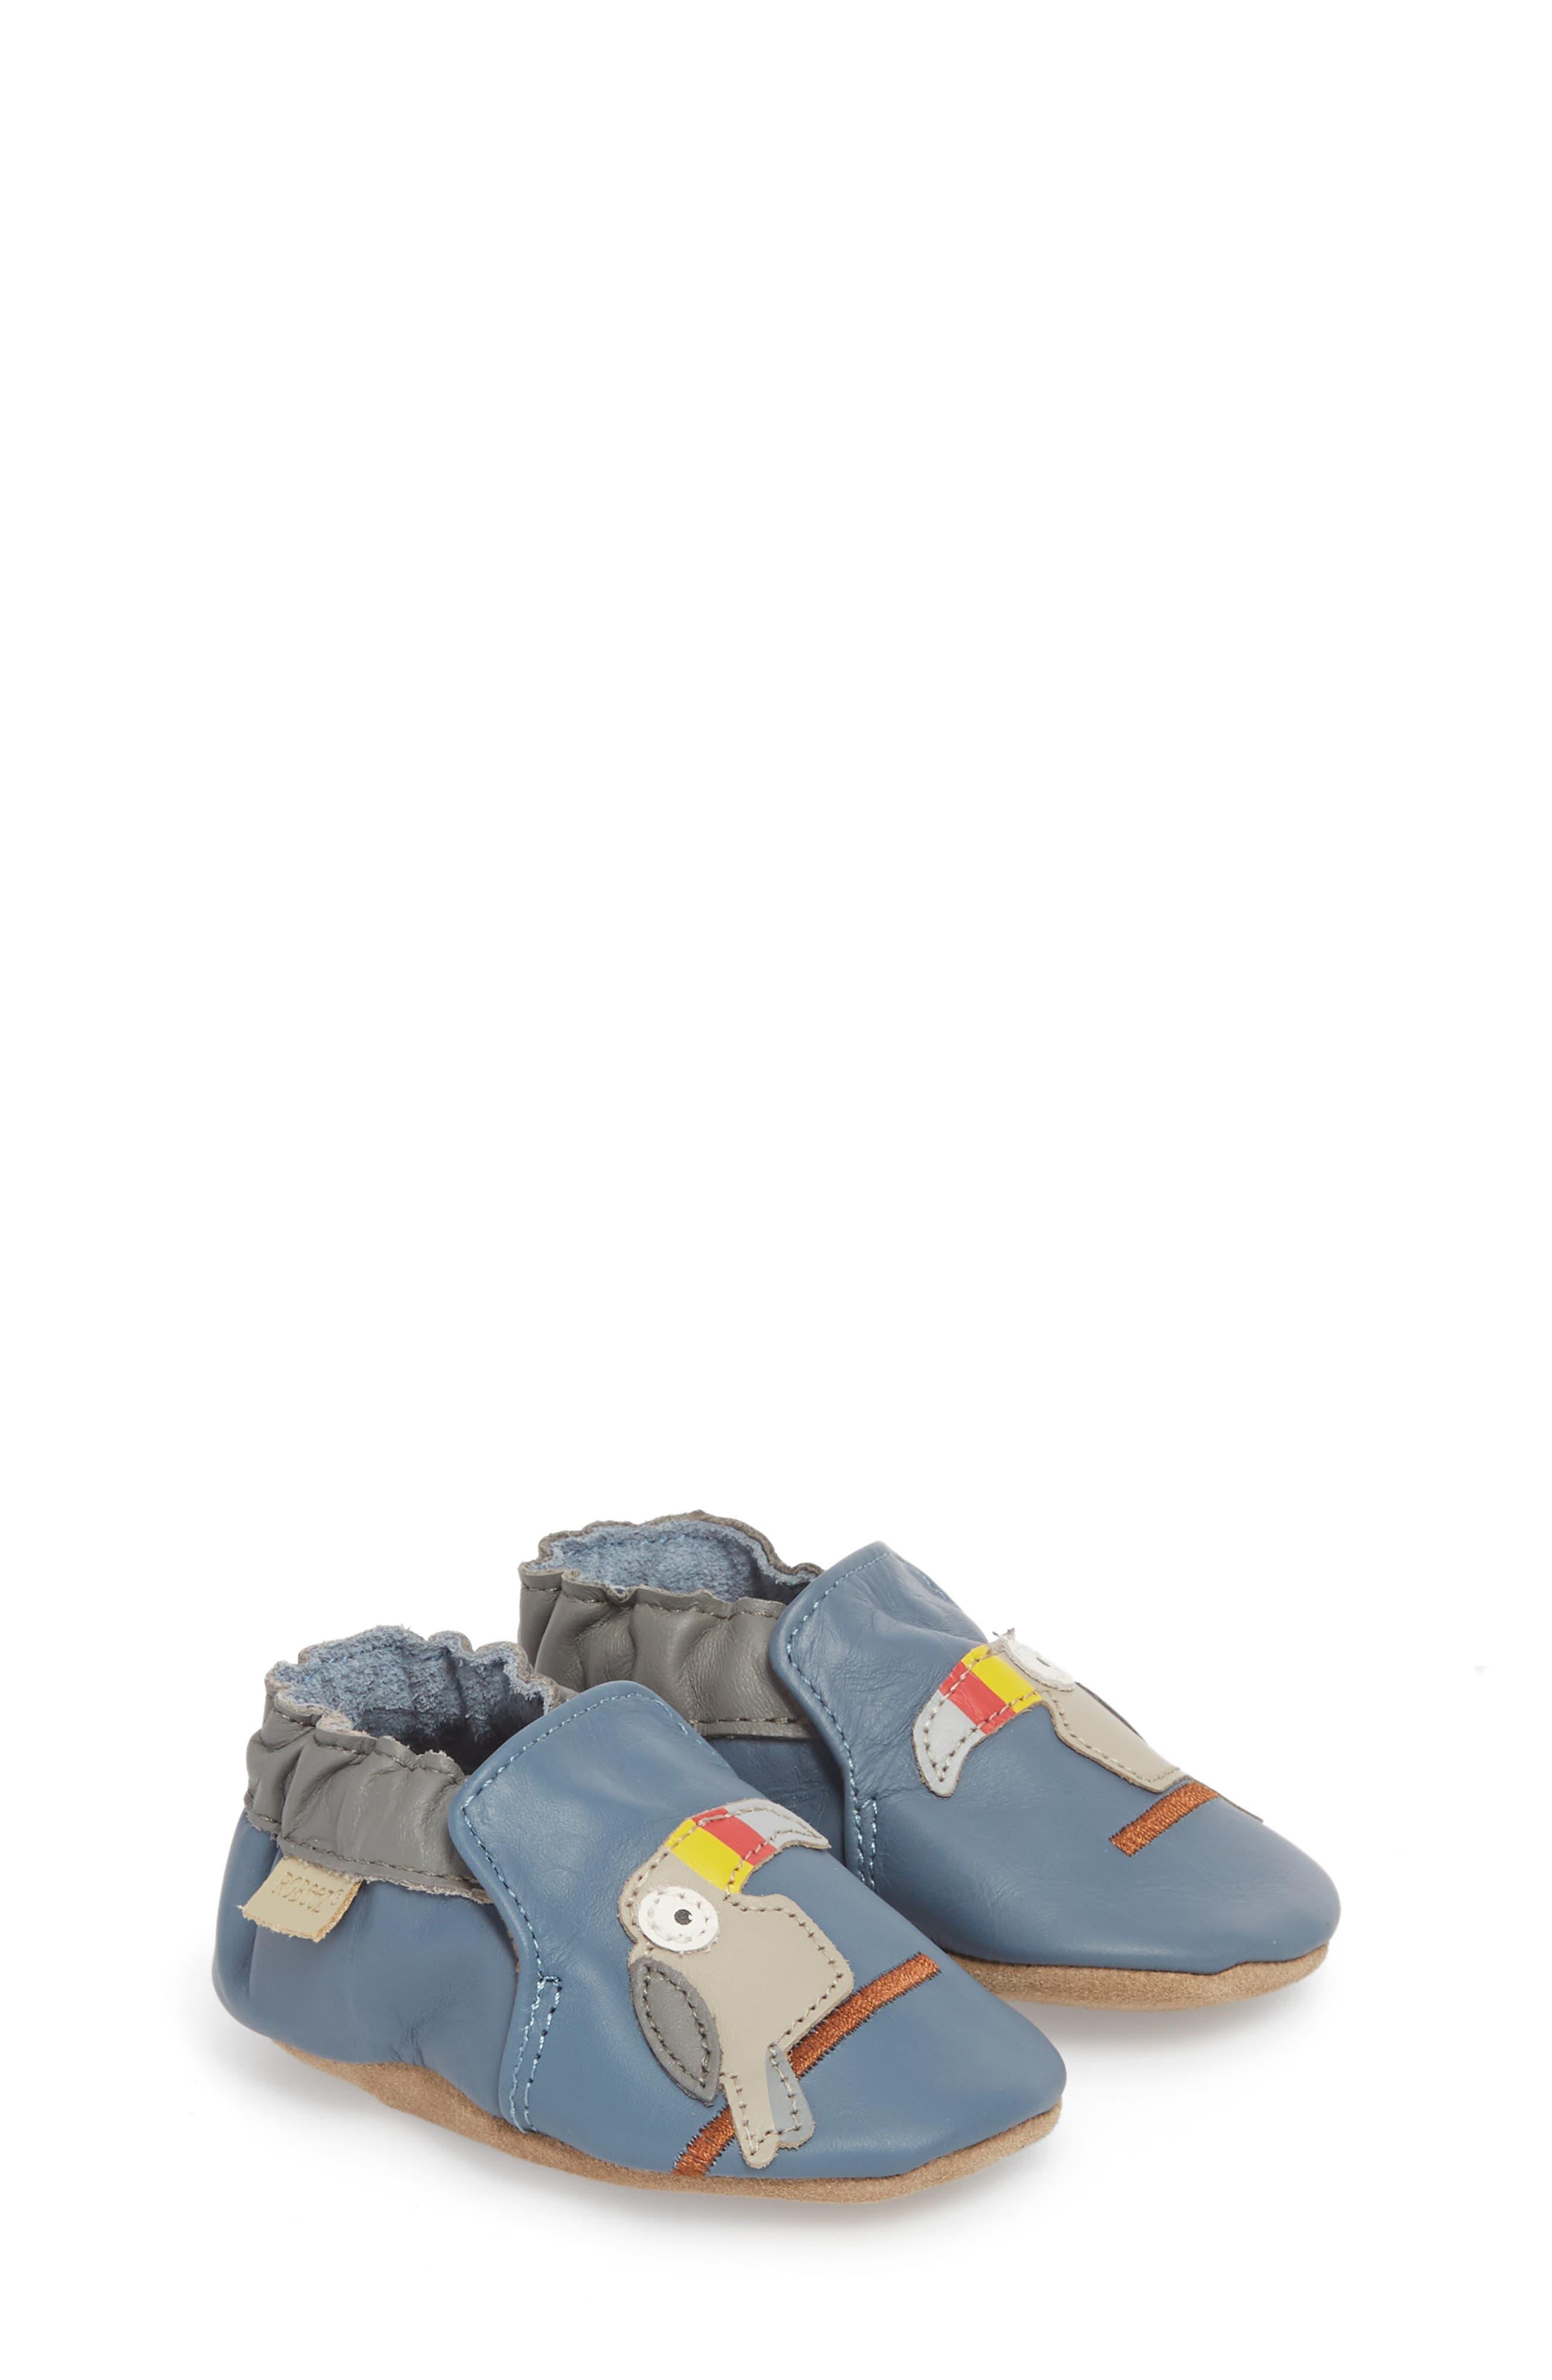 Toucan Tom Moccasin Crib Shoe,                             Main thumbnail 1, color,                             450